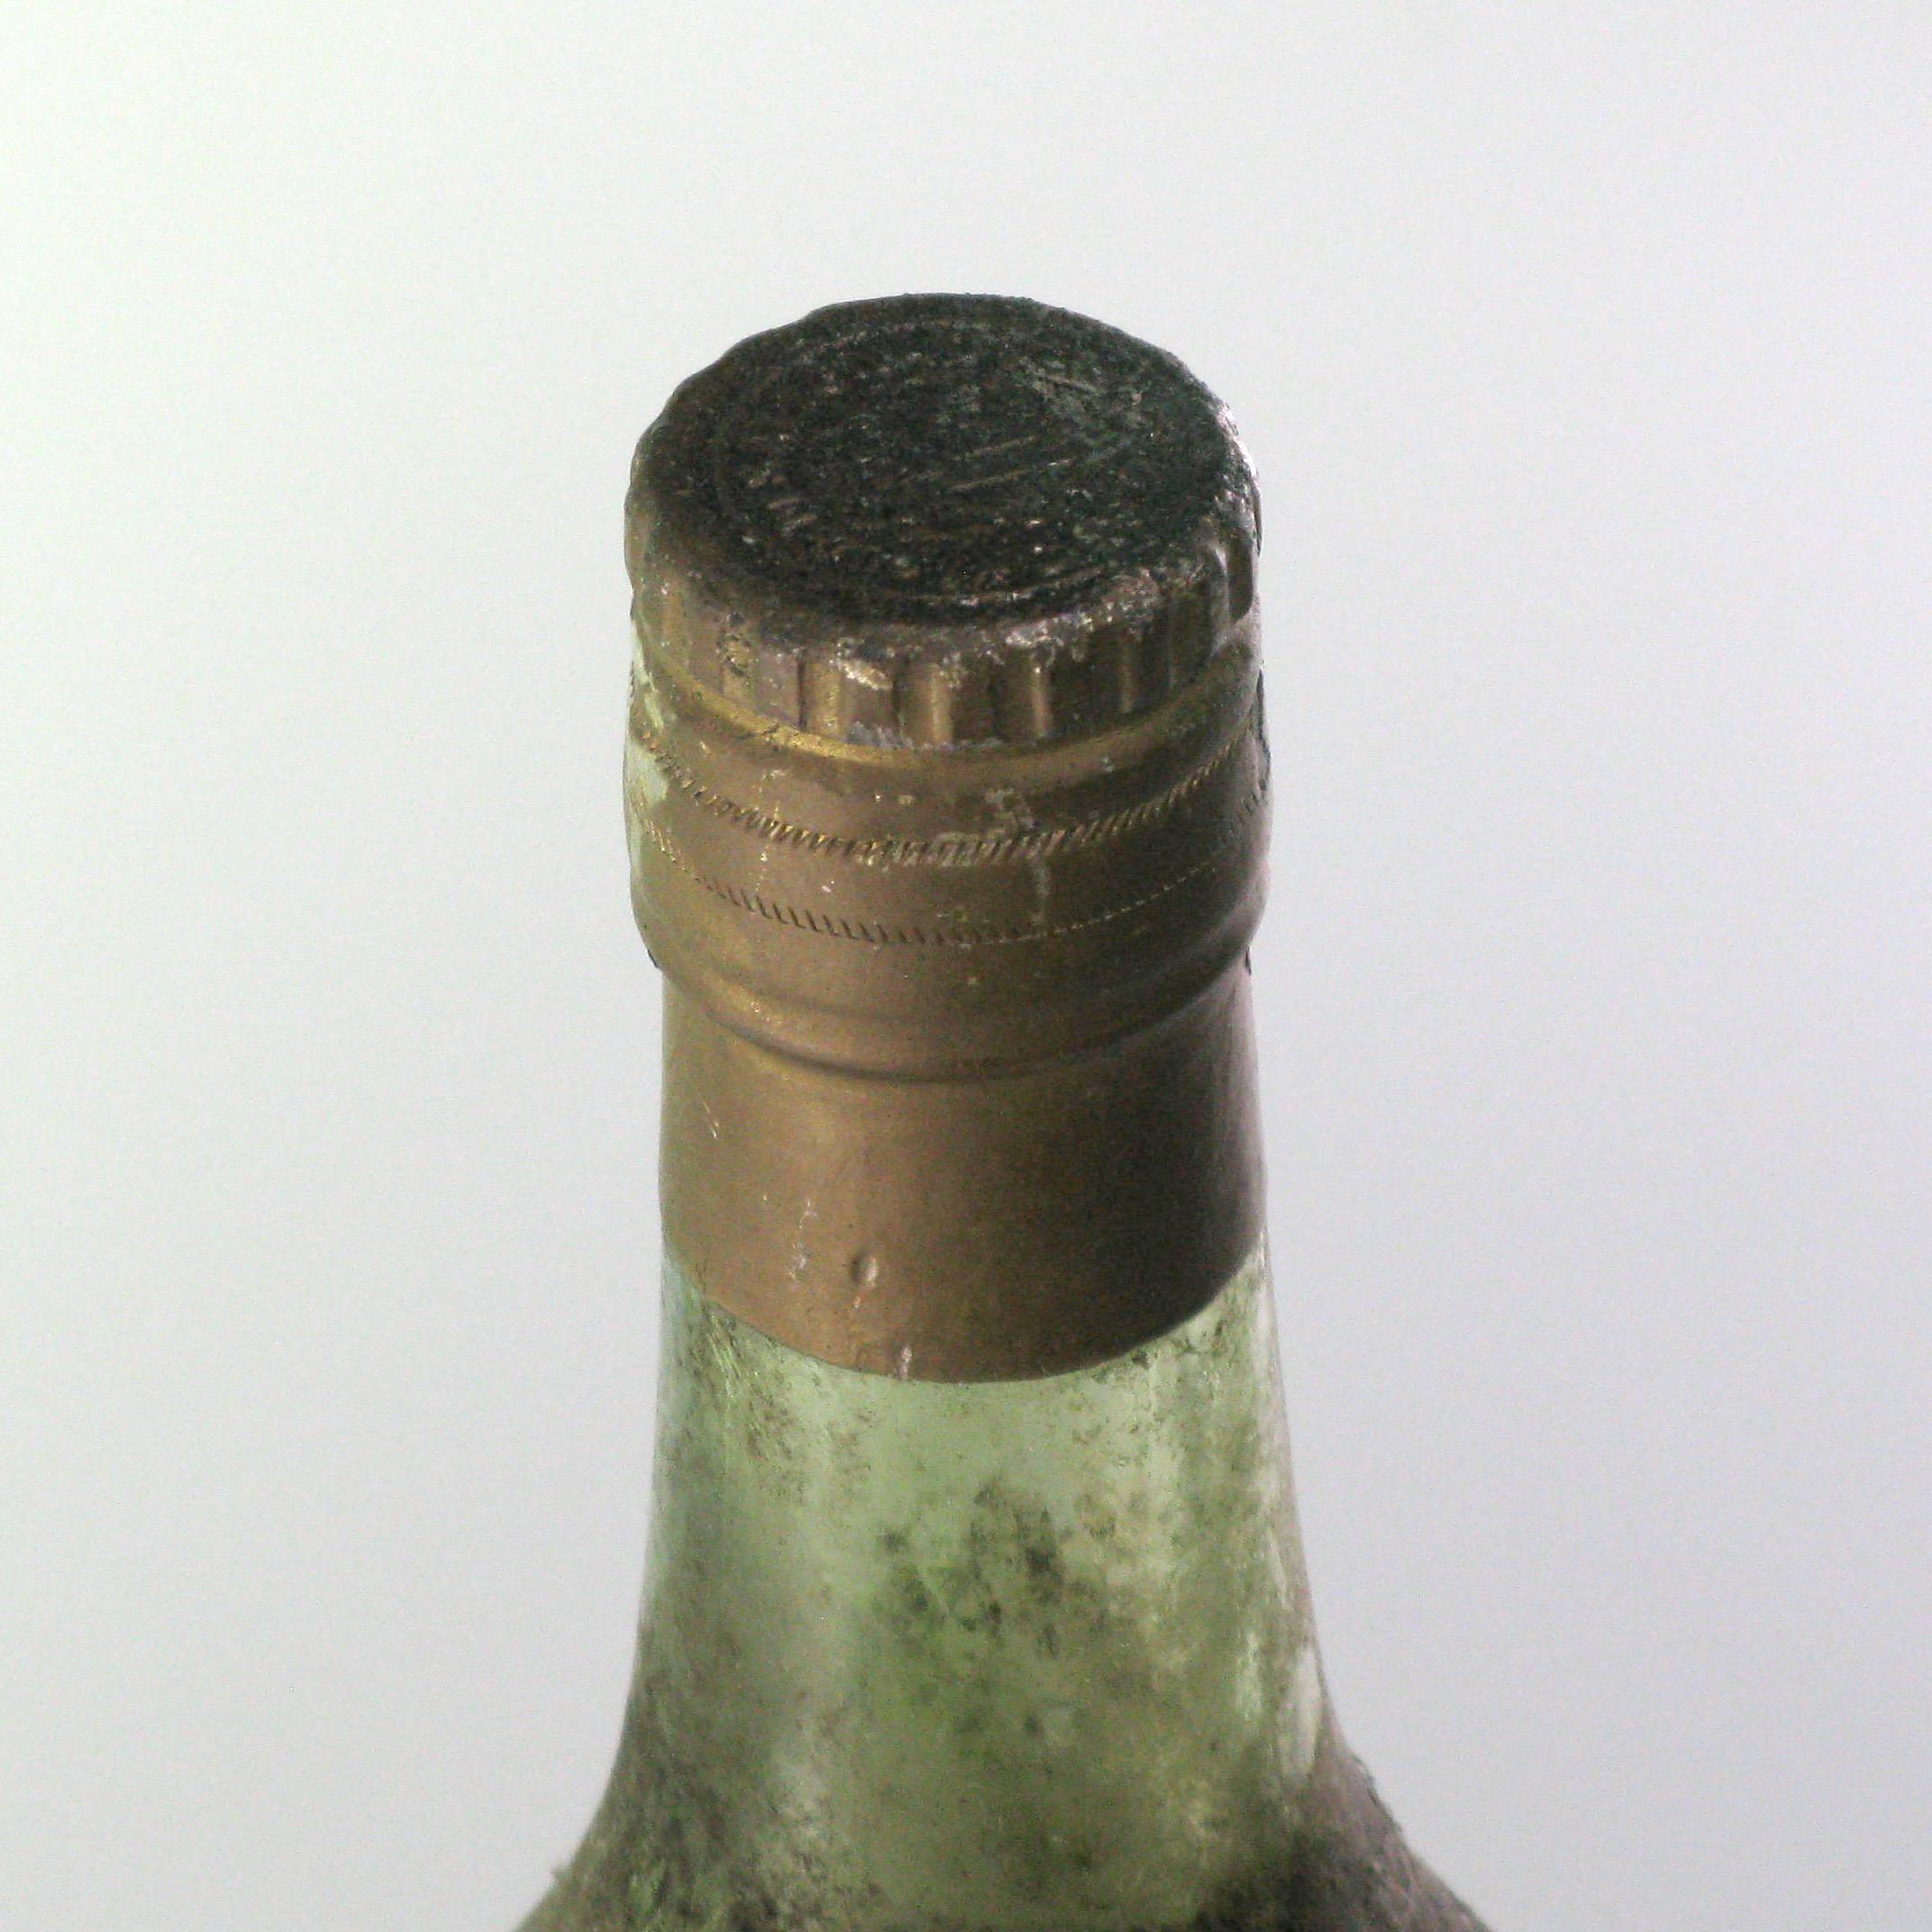 Cognac 1893 Salignac